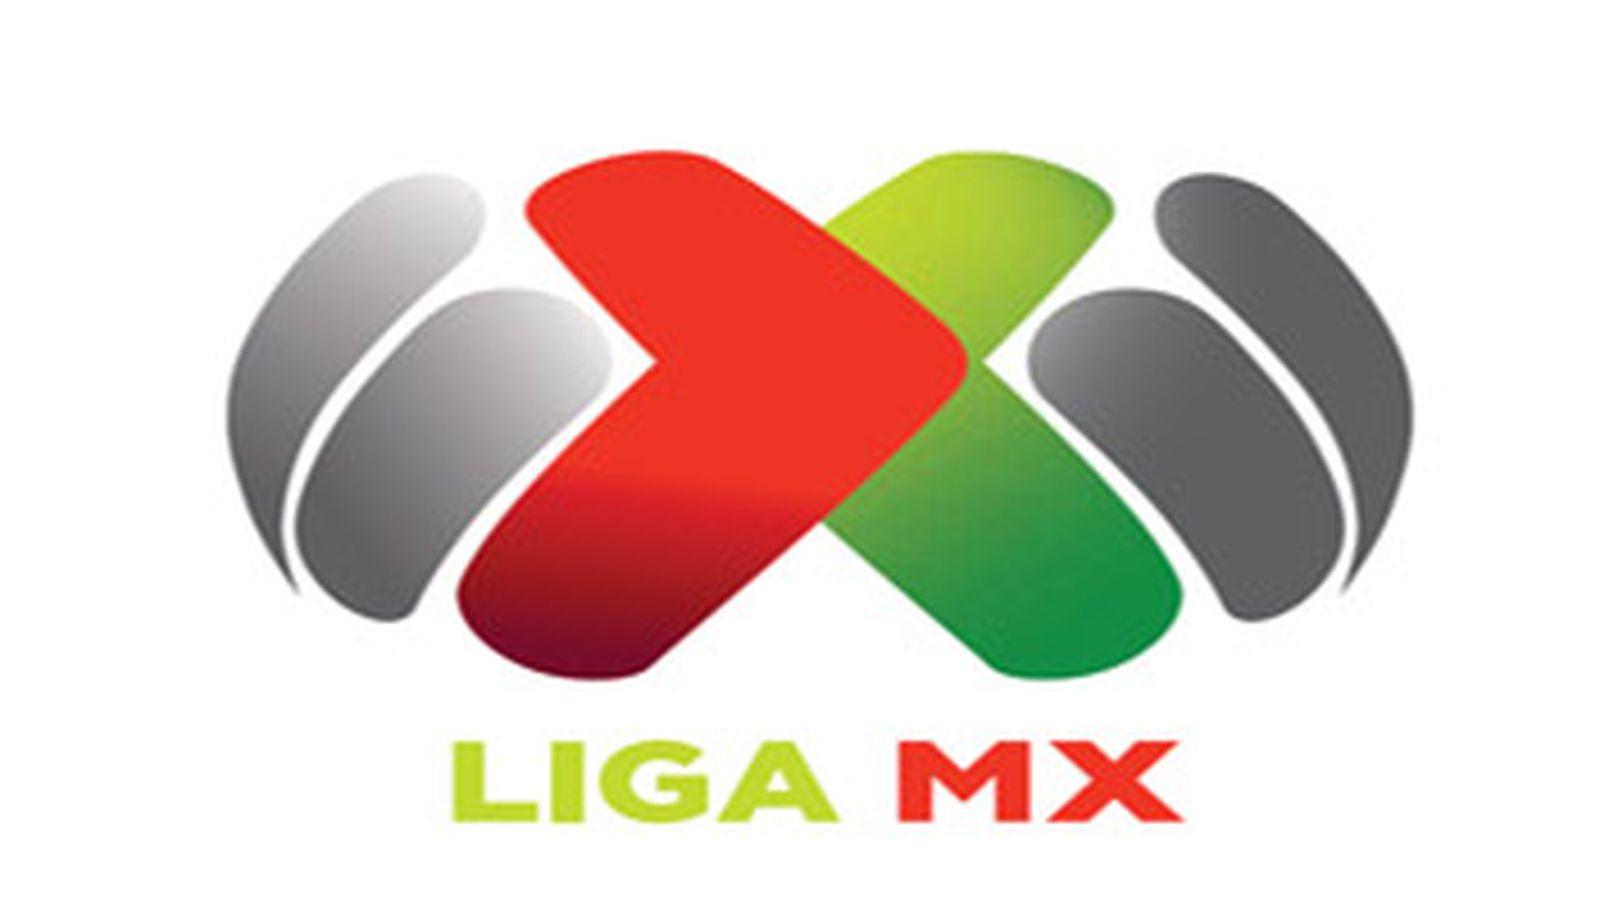 liga mx - photo #1